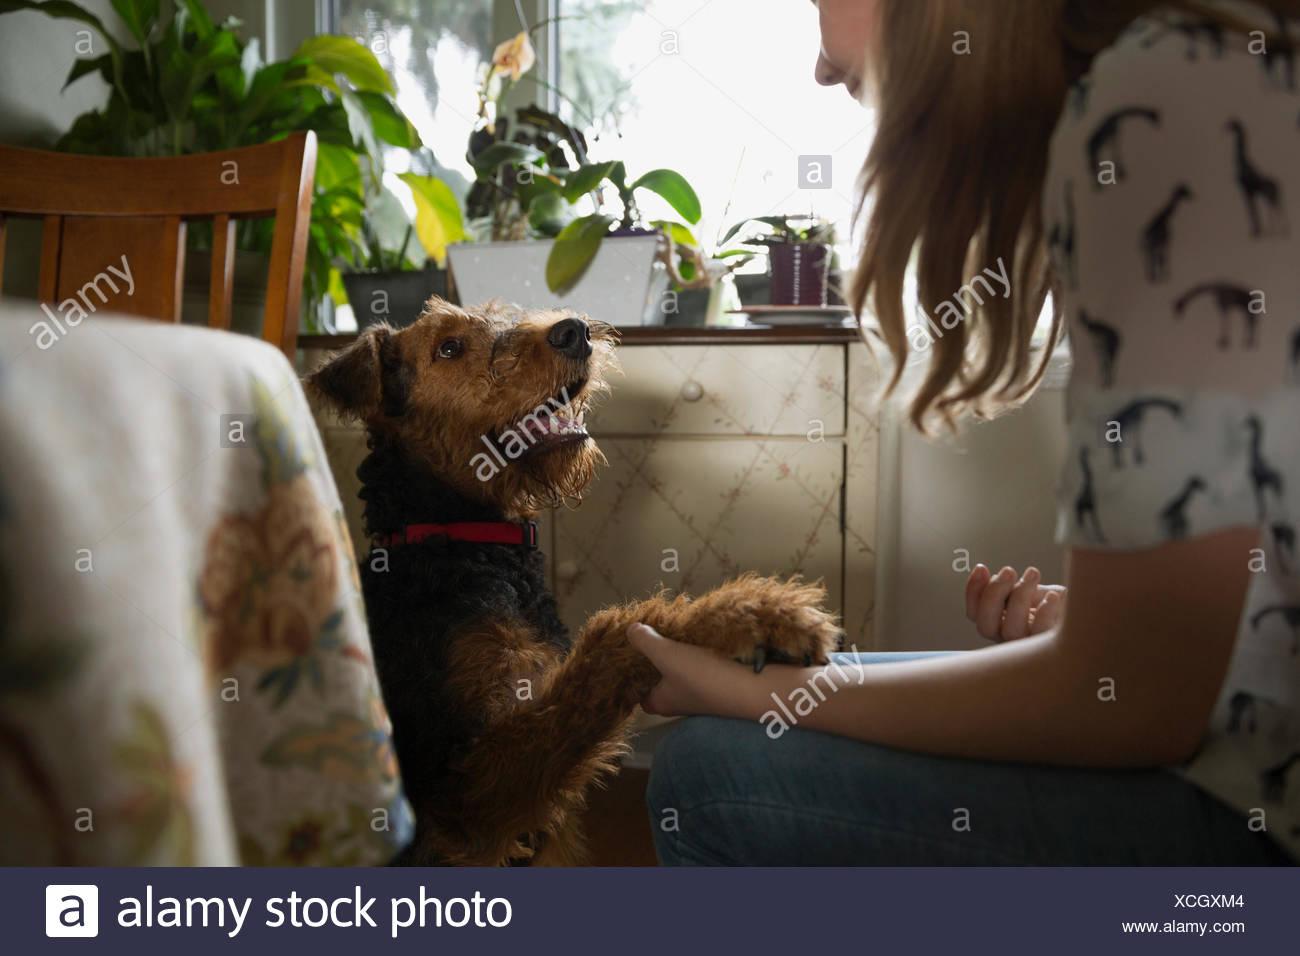 Girl shaking dog paw in kitchen - Stock Image